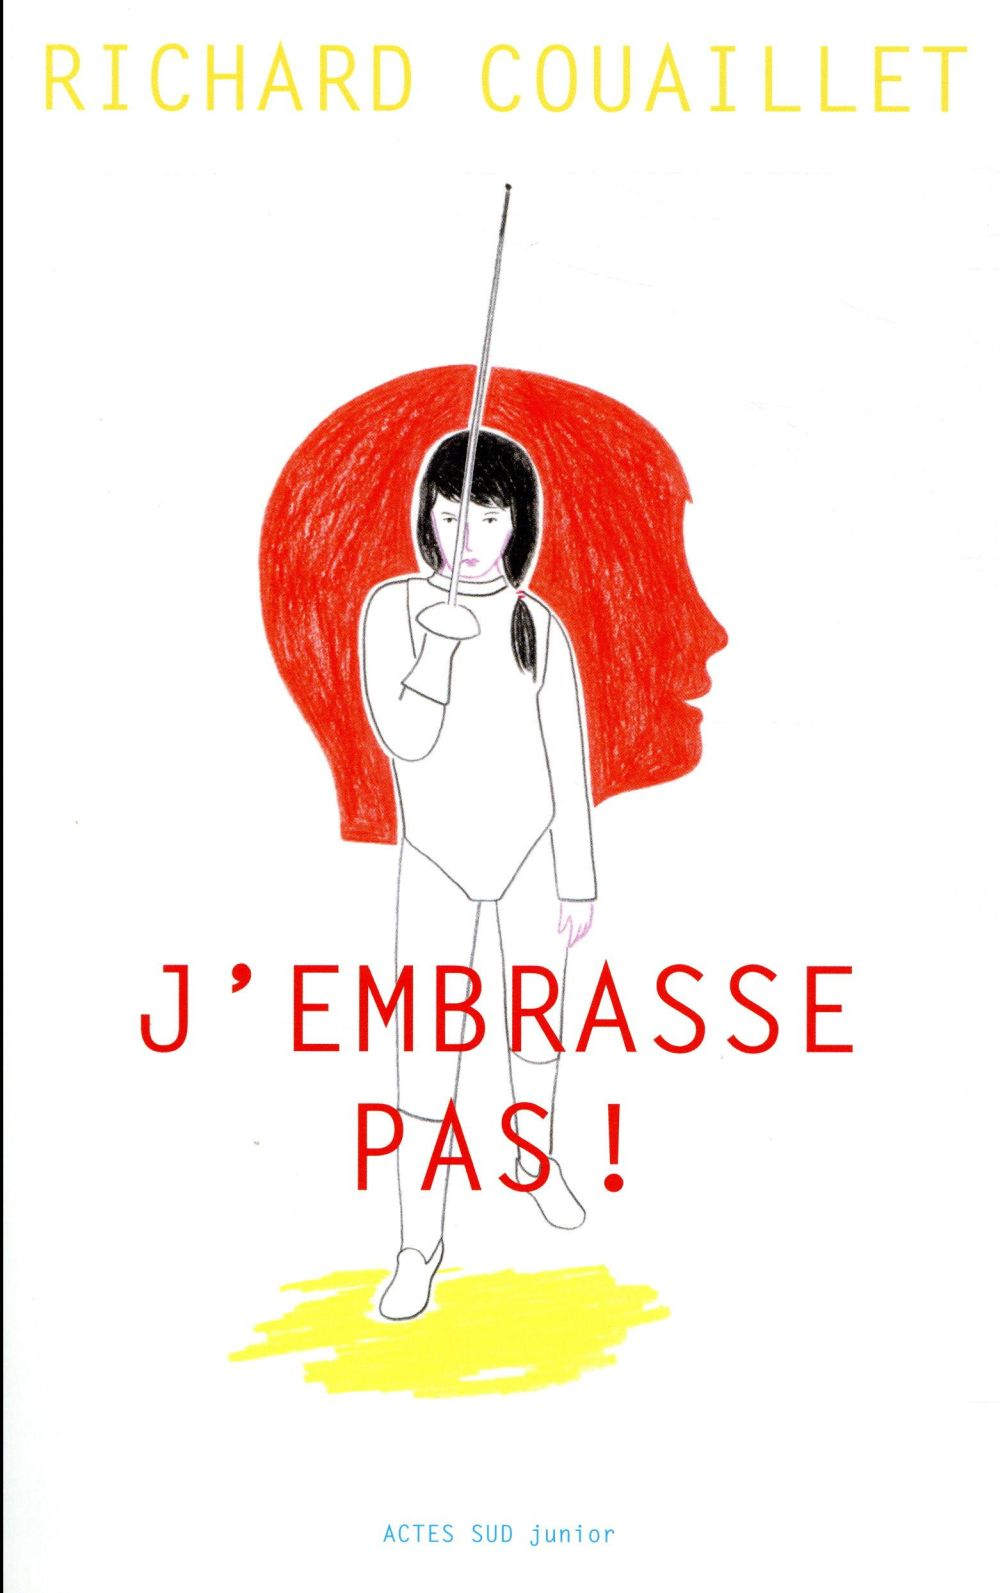 J'EMBRASSE PAS